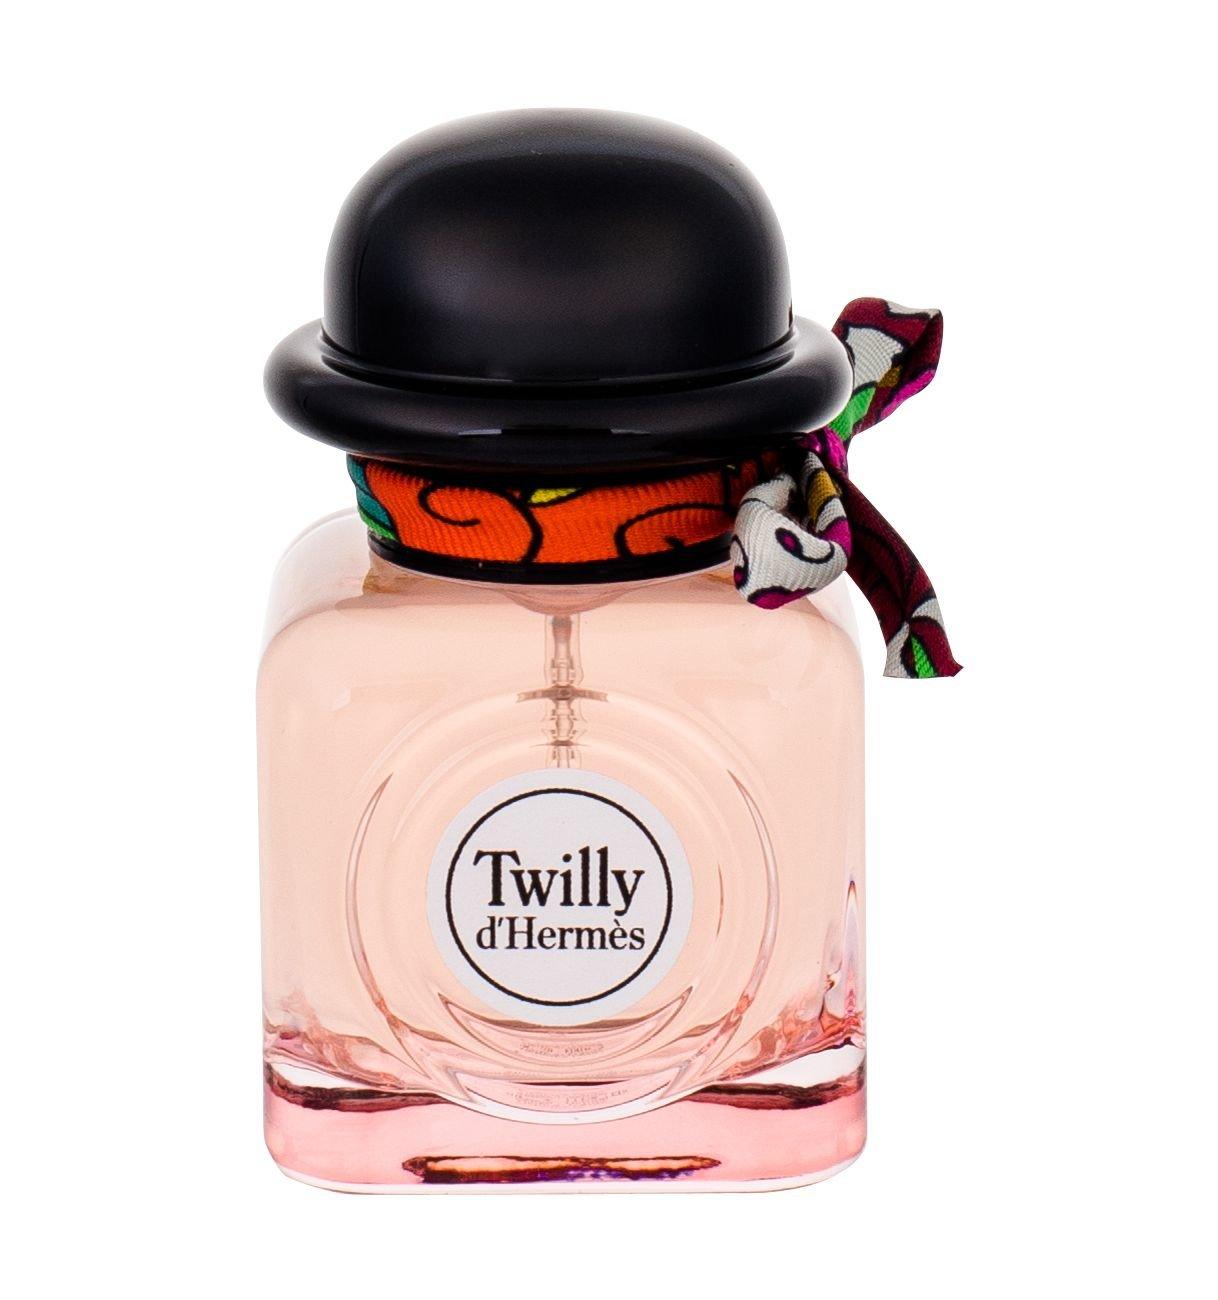 Hermes Twilly d´Hermes Eau de Parfum 30ml